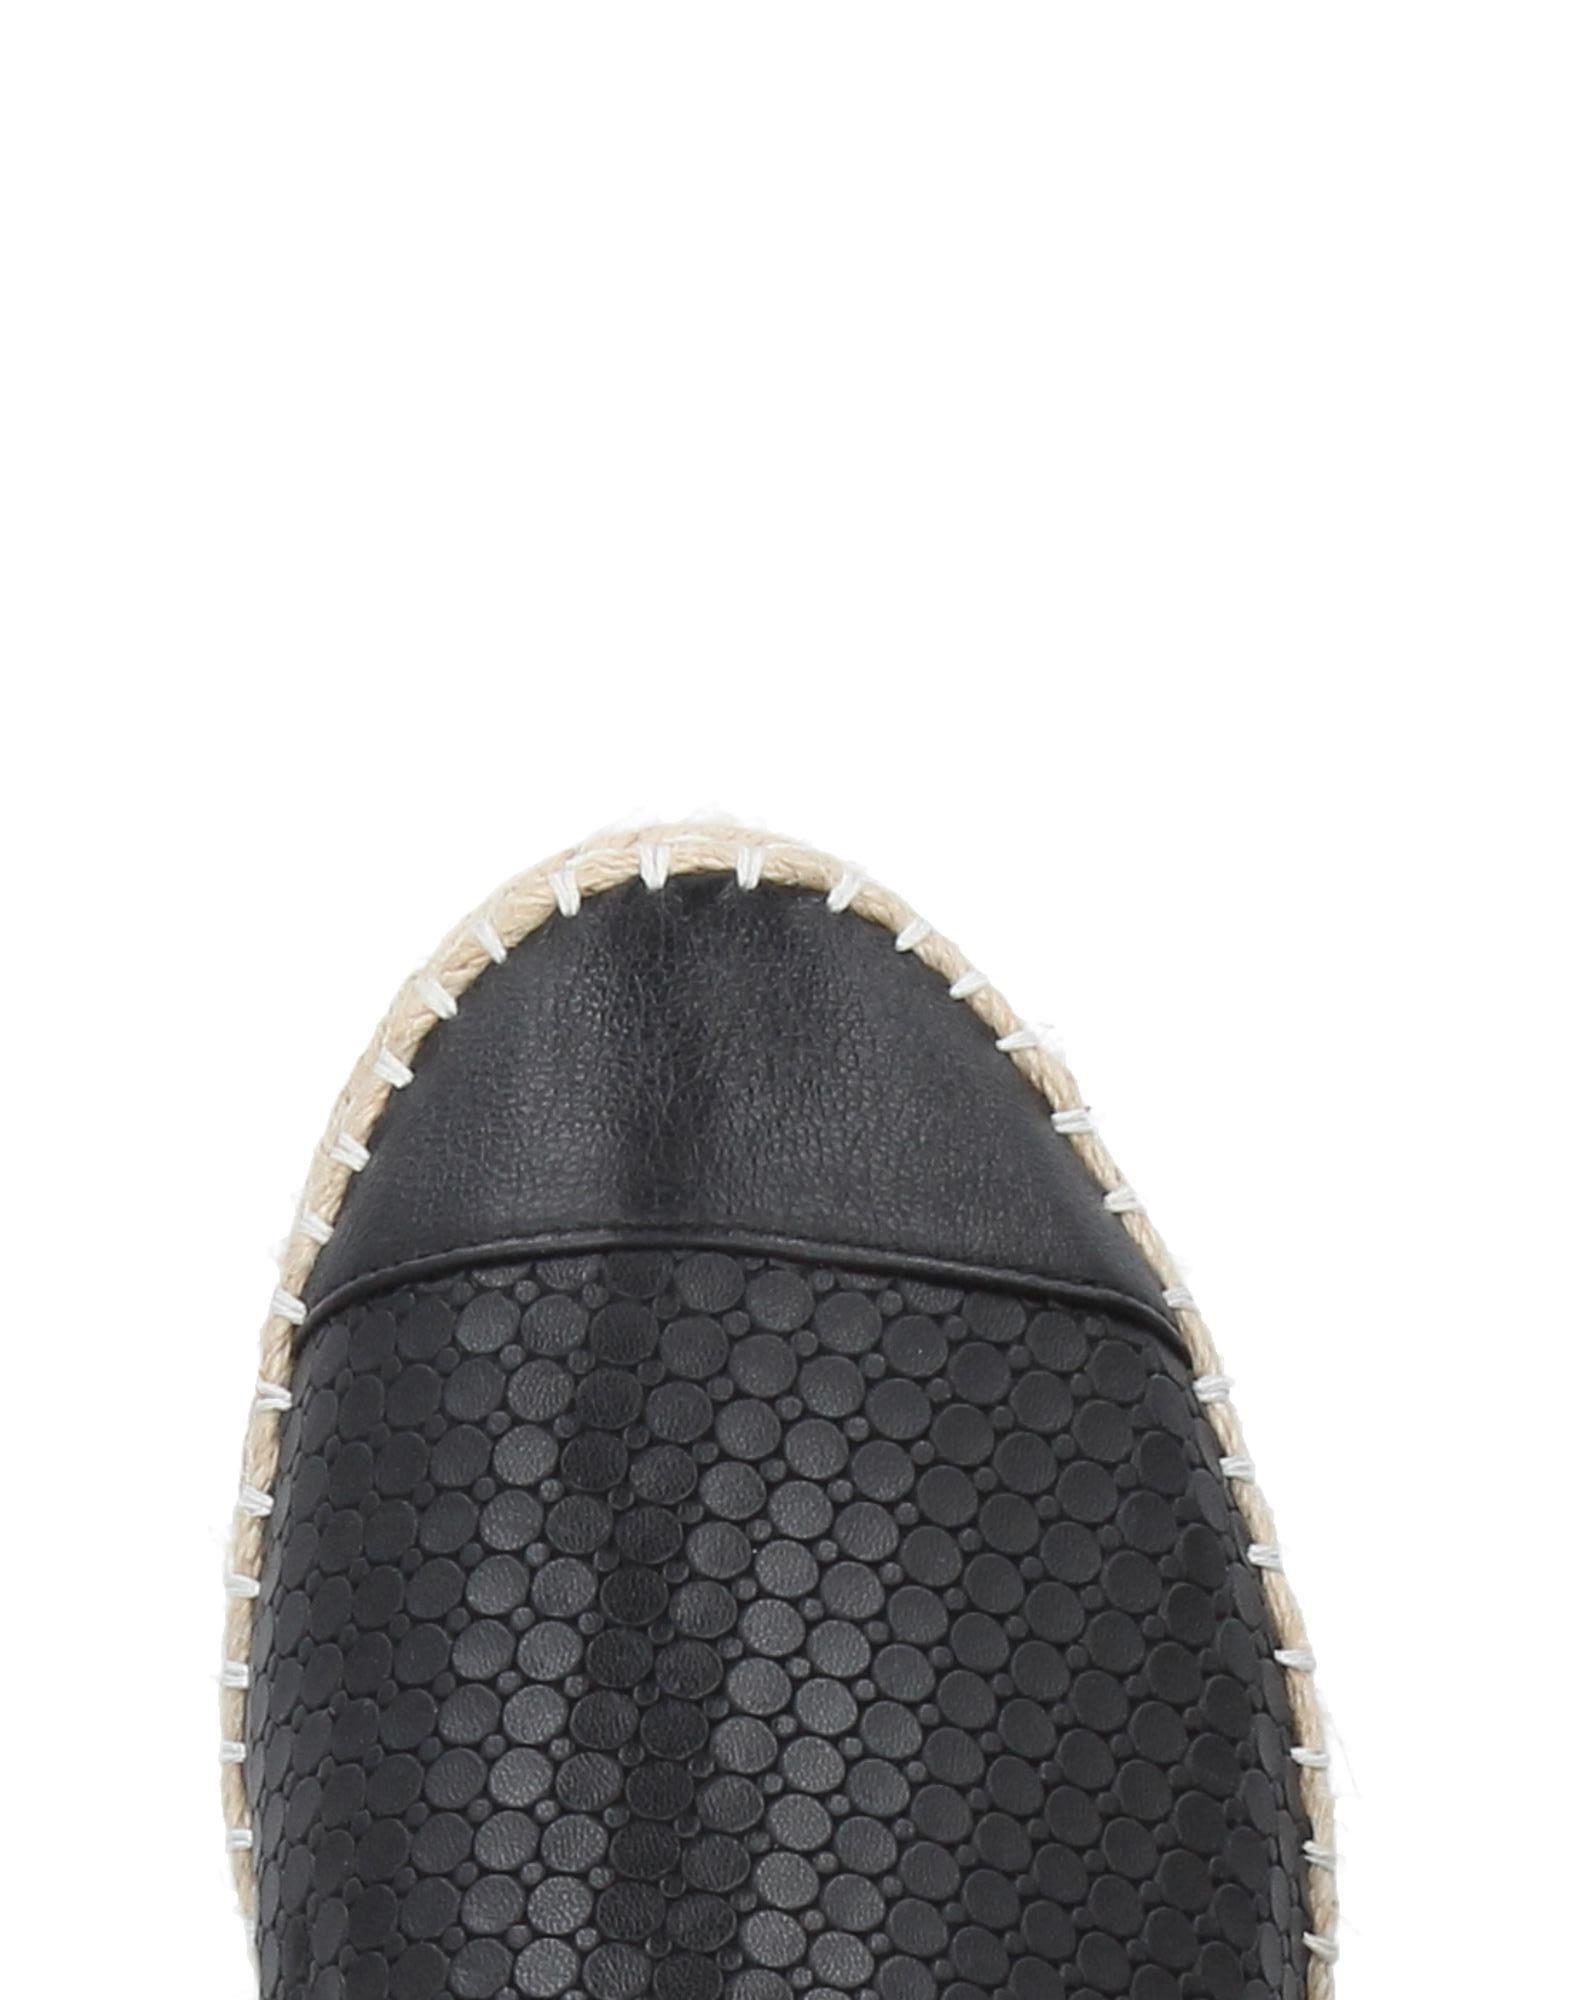 Fiorangelo Espadrilles beliebte Damen 11378419AW Gute Qualität beliebte Espadrilles Schuhe 03229f